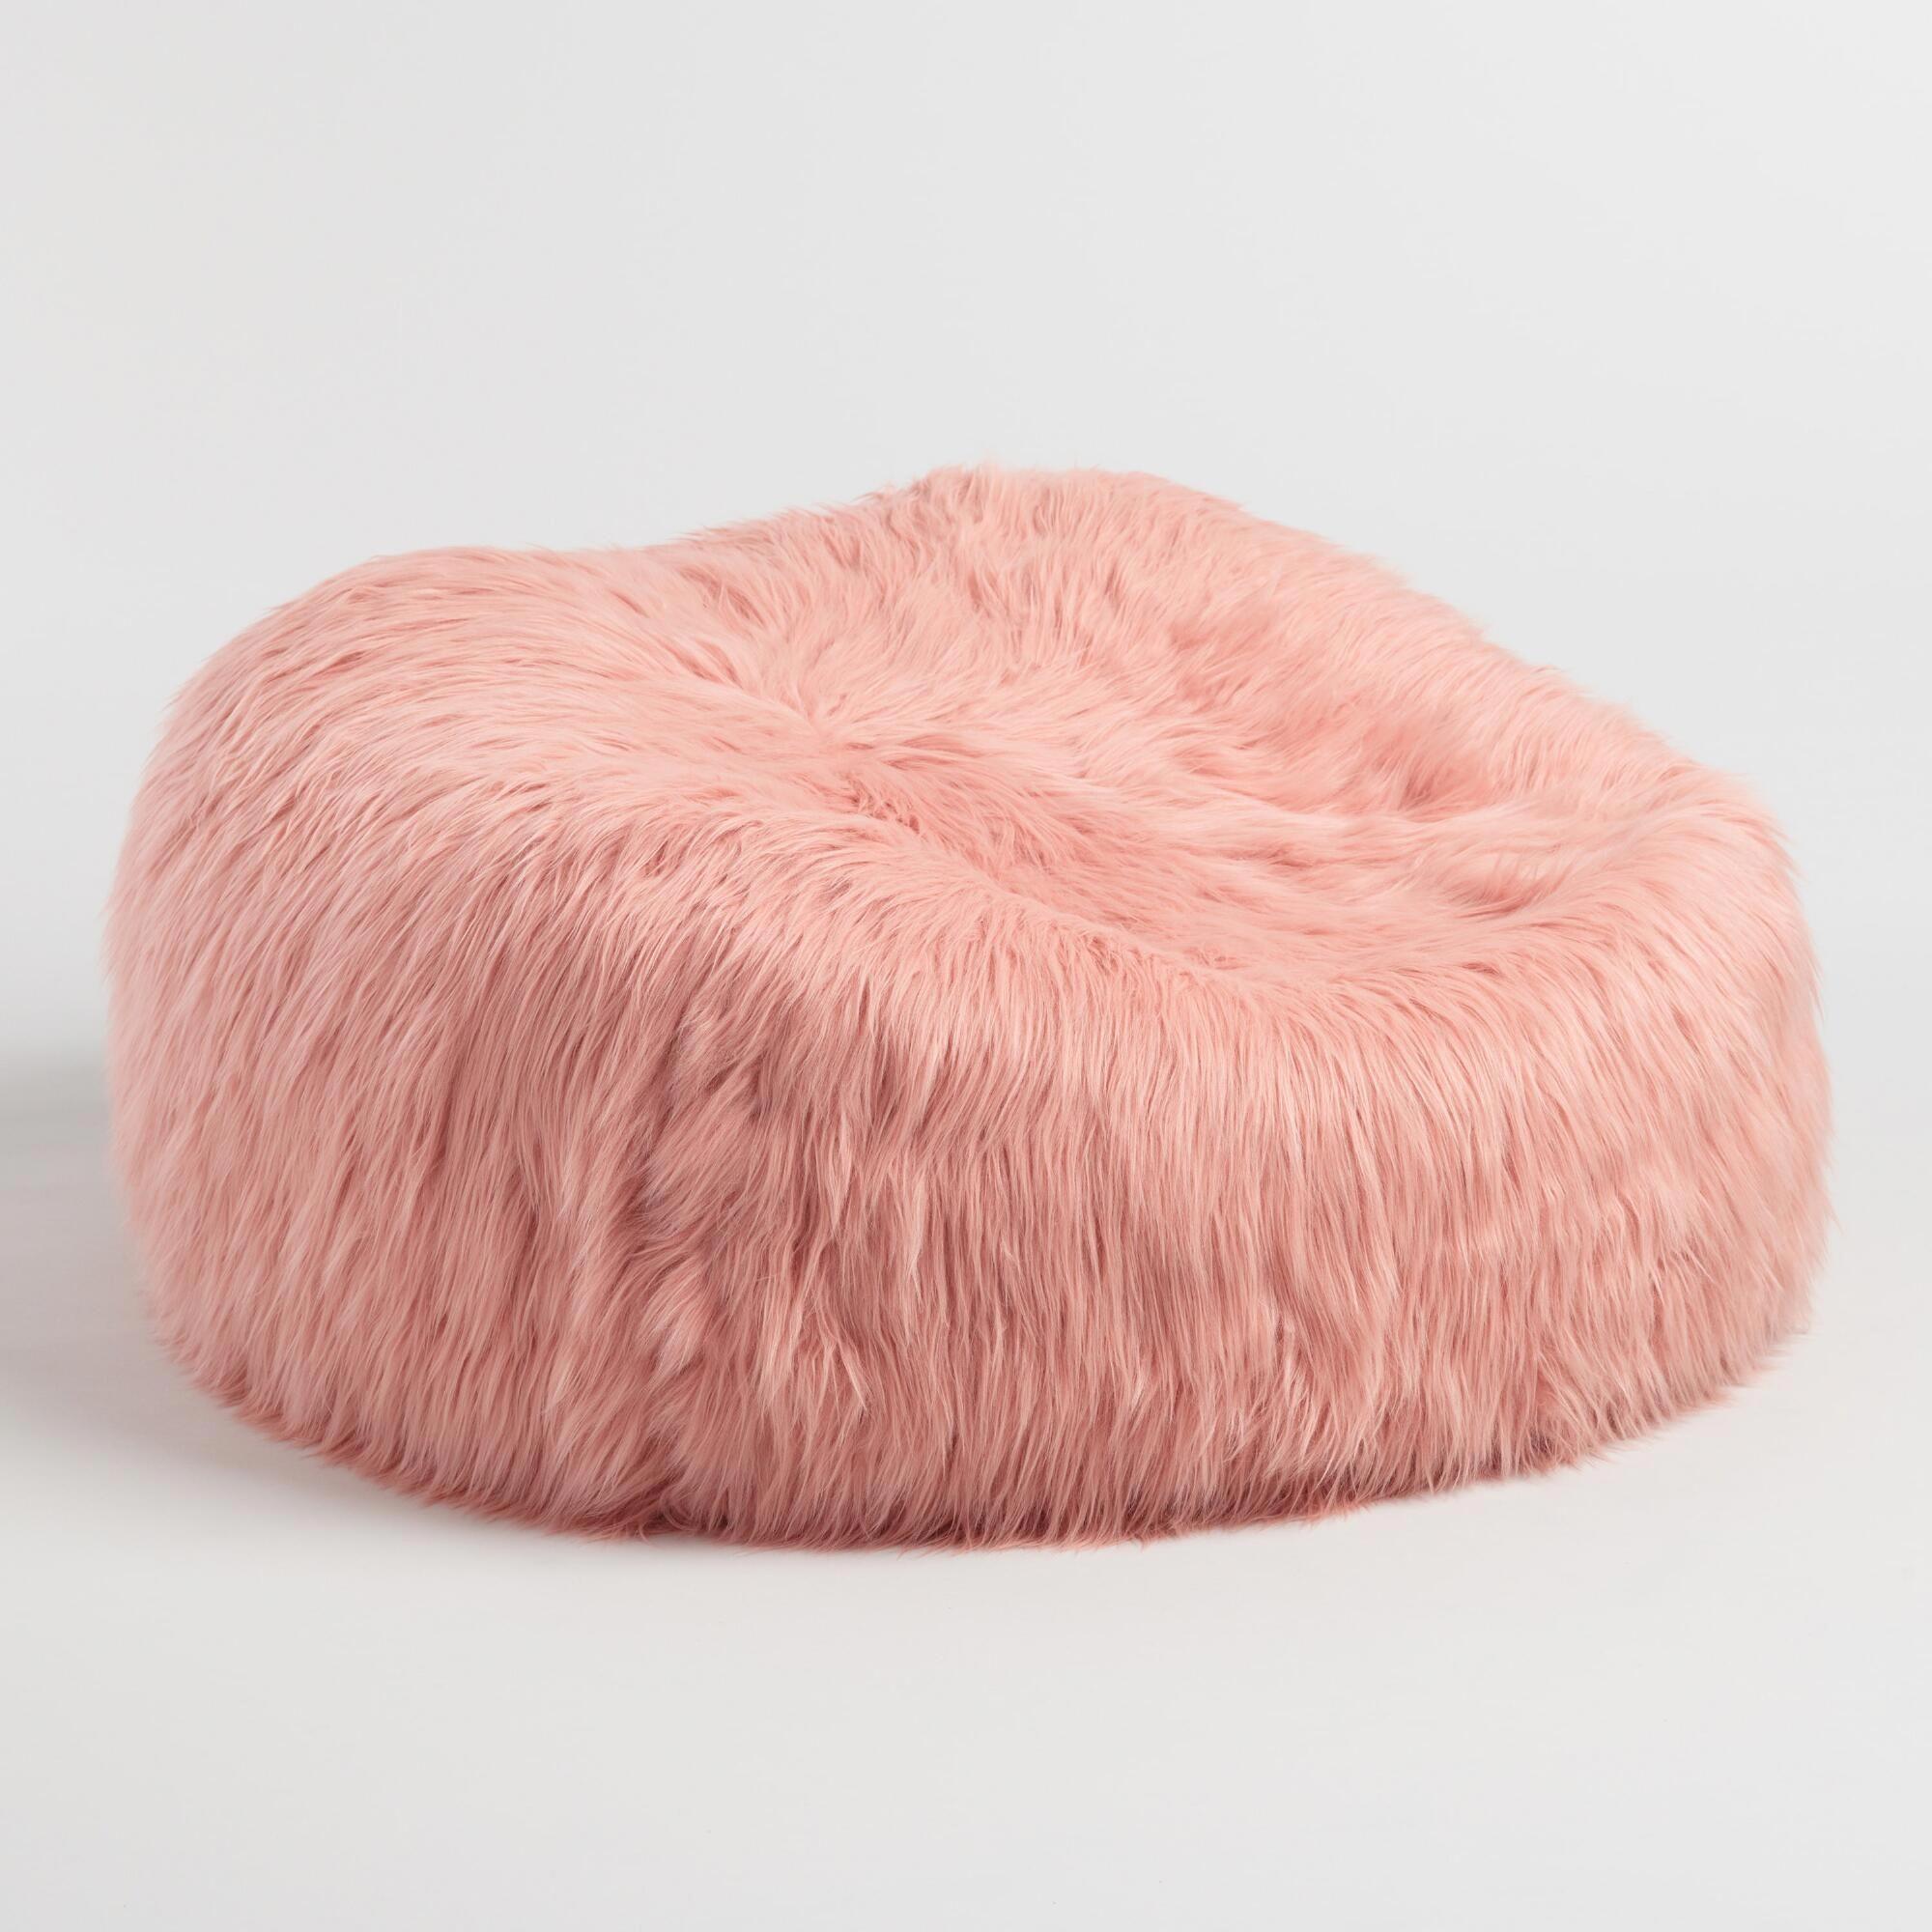 fcdf70fe0c Blush Mongolian Faux Fur Bean Bag Chair by World Market  beanbagchairs